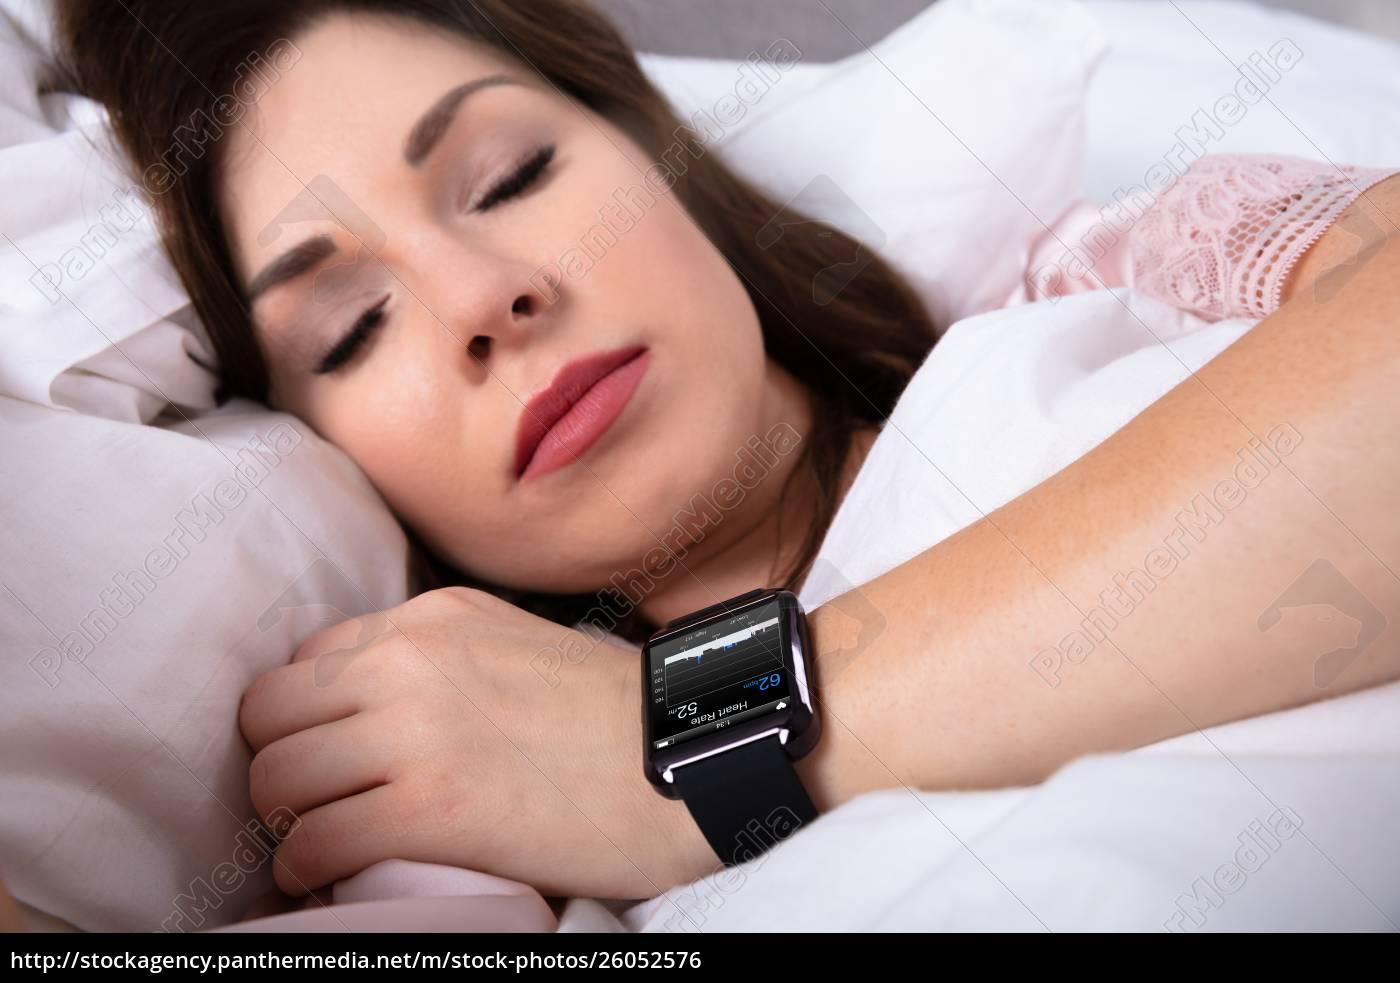 close-up, of, a, beautiful, woman, sleeping - 26052576